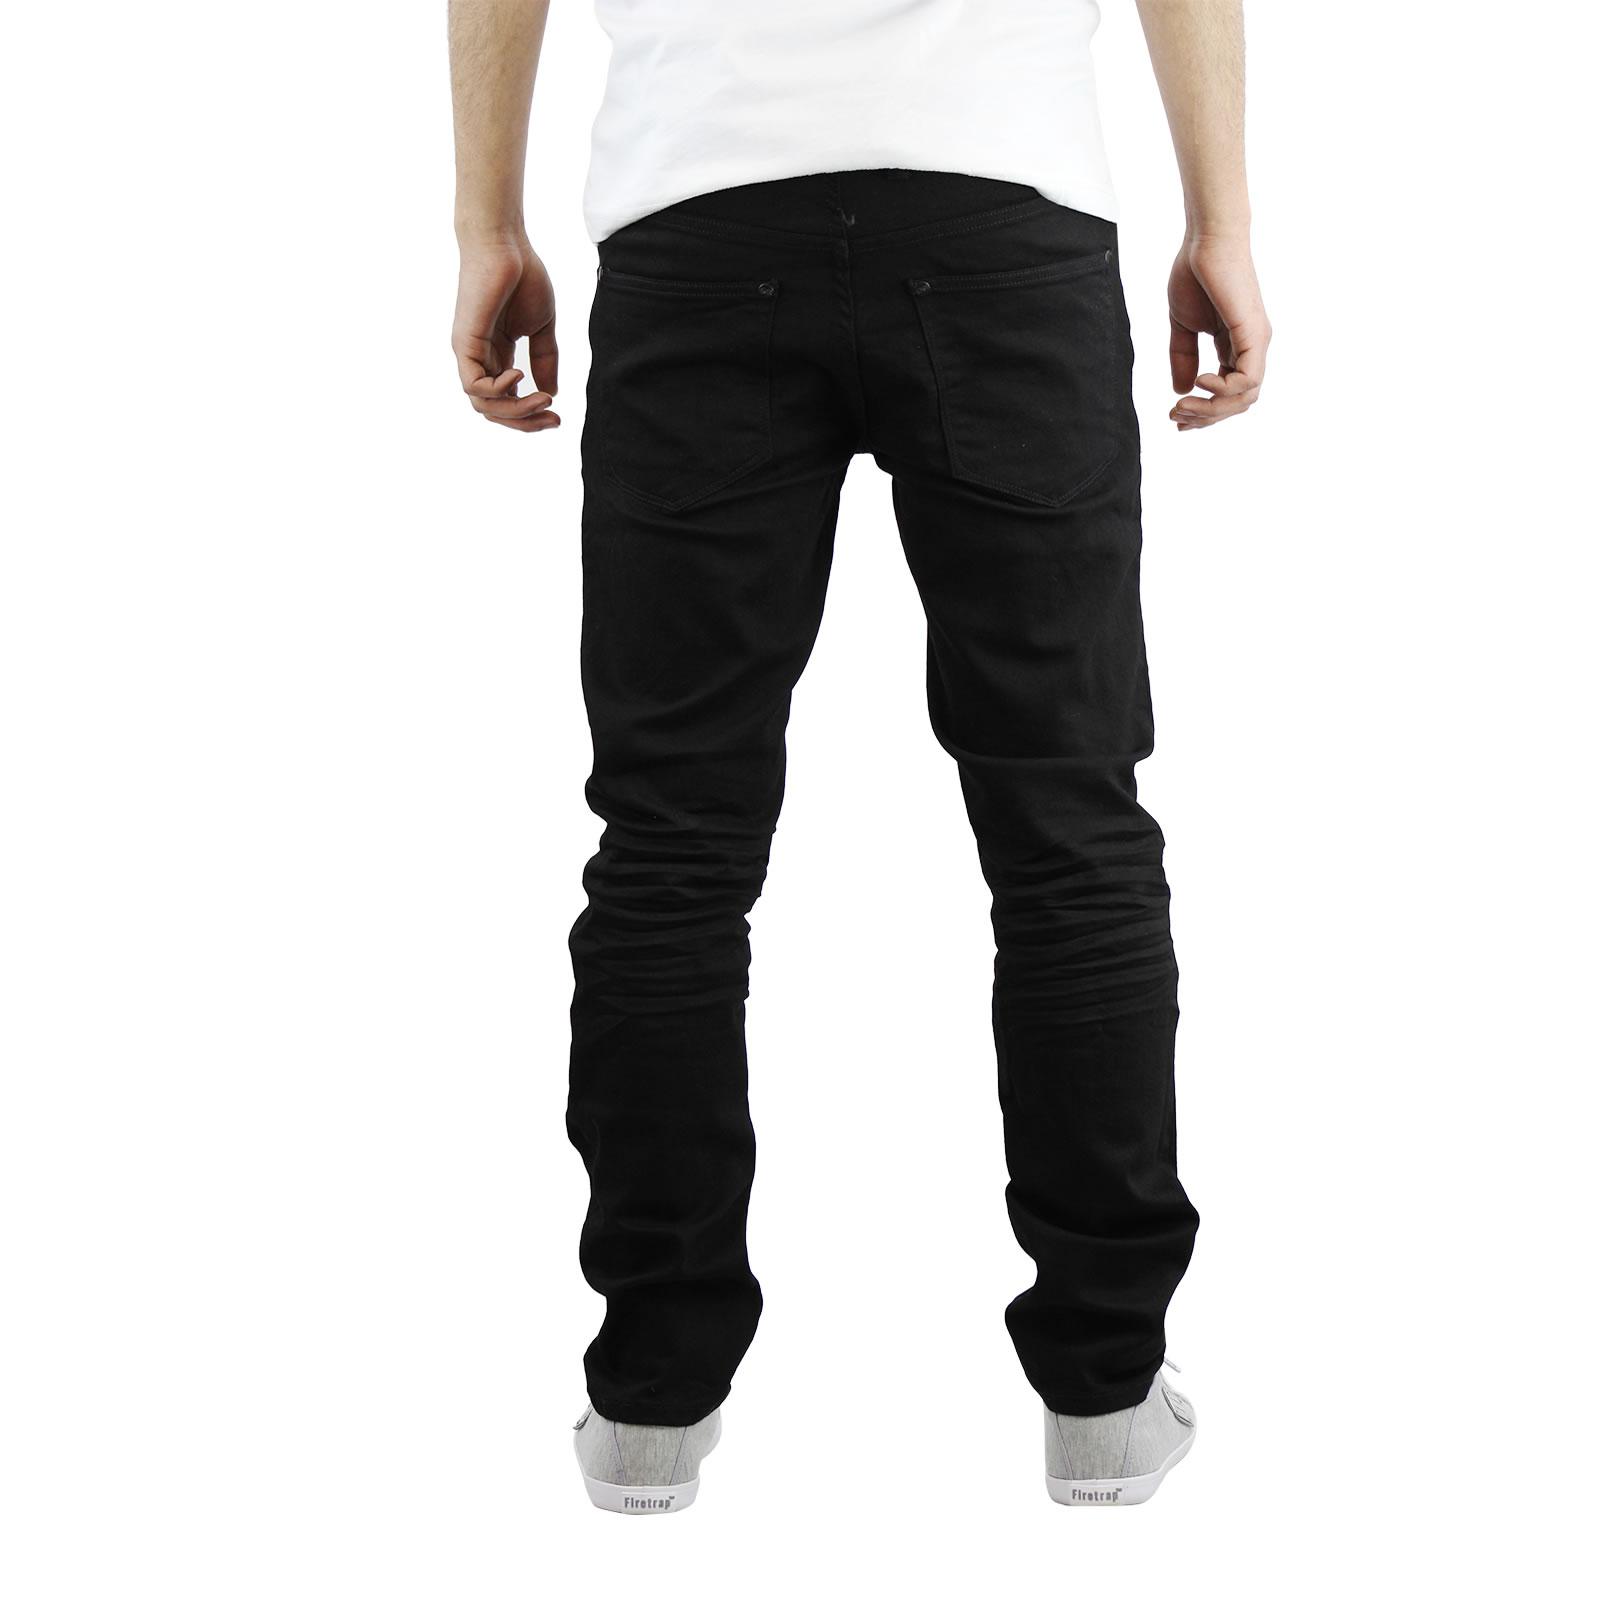 miniature 4 - Homme Crosshatch Jaco Slim Jeans stretch pantalon denim effet vieilli